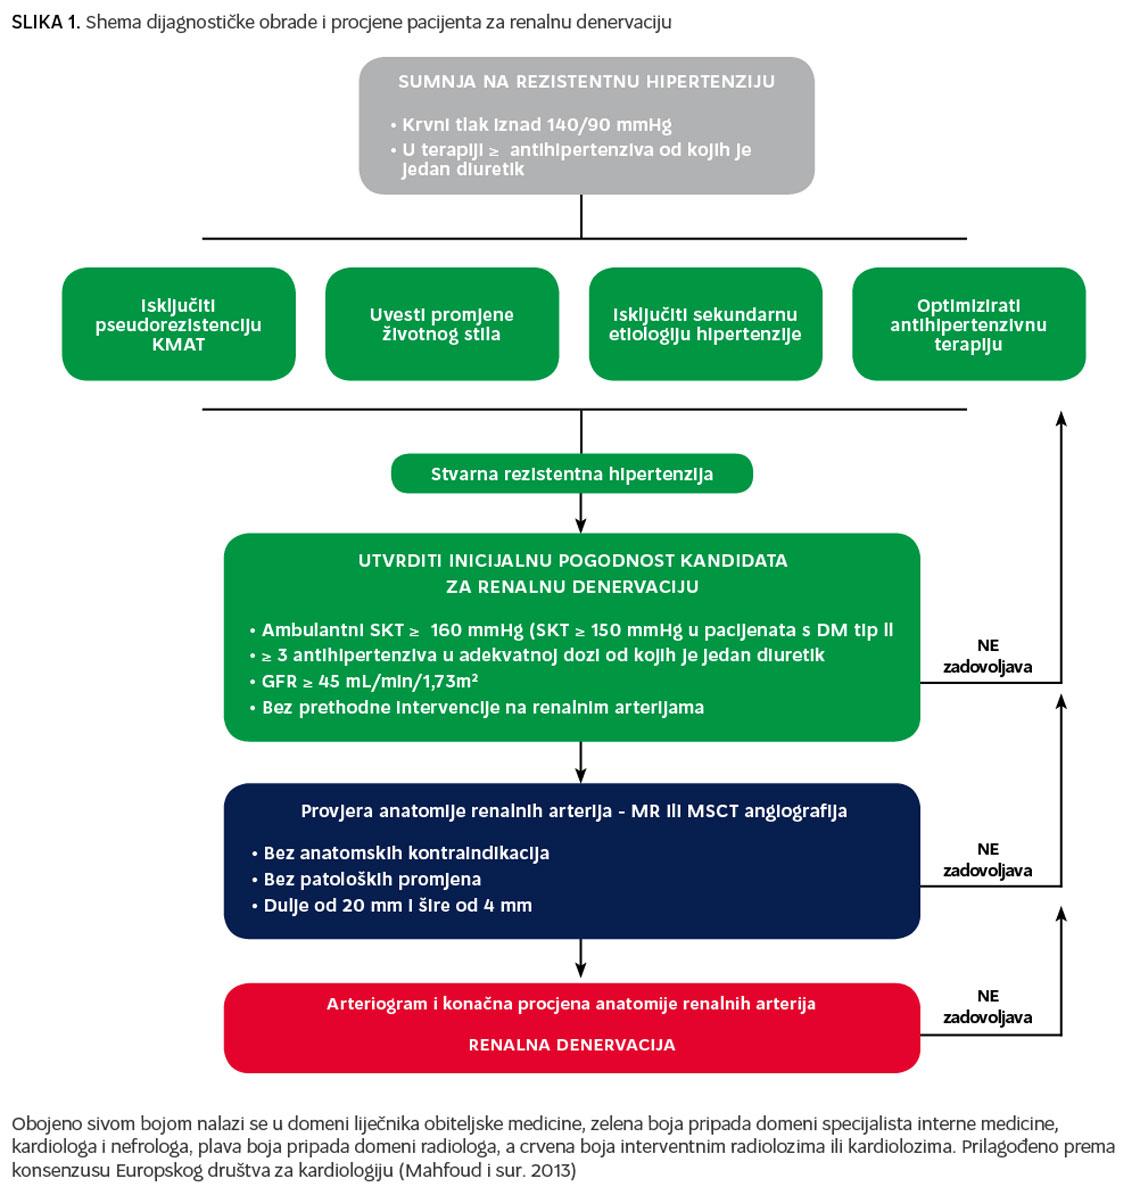 Epistaksa + u hipertenziji